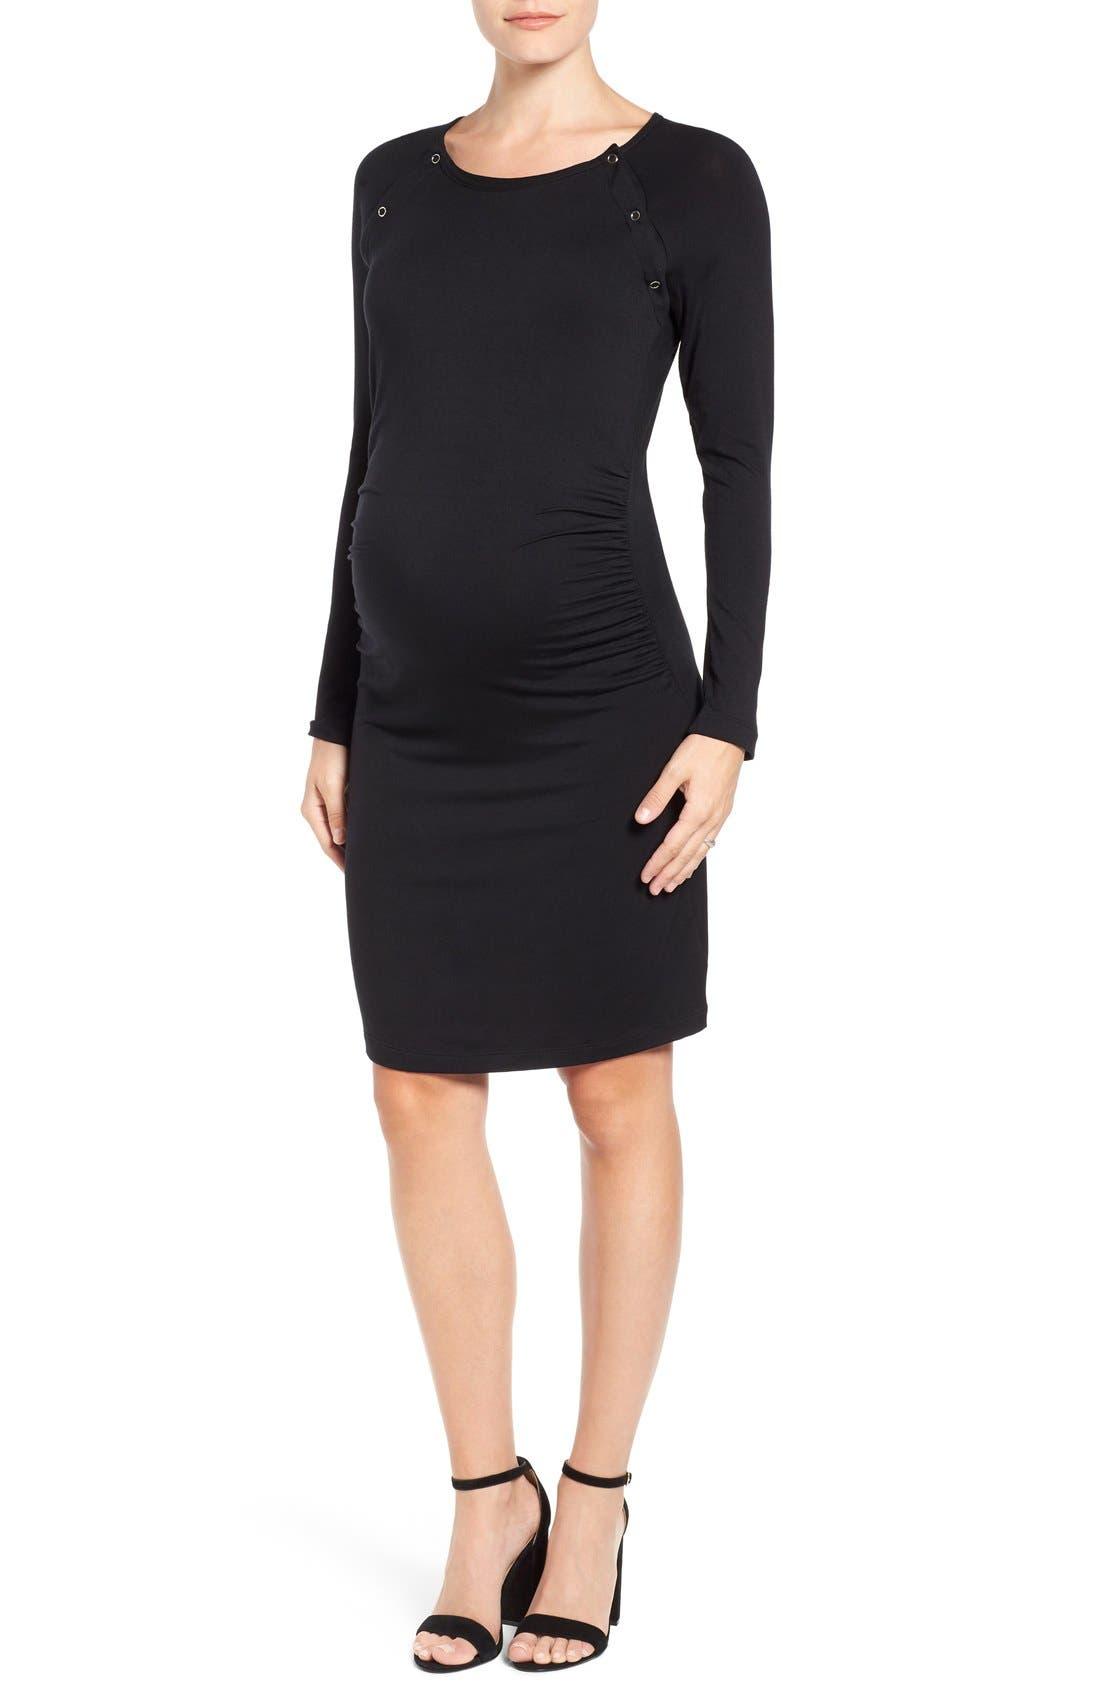 'Alex' Ruched Maternity/Nursing Dress,                             Main thumbnail 1, color,                             BLACK